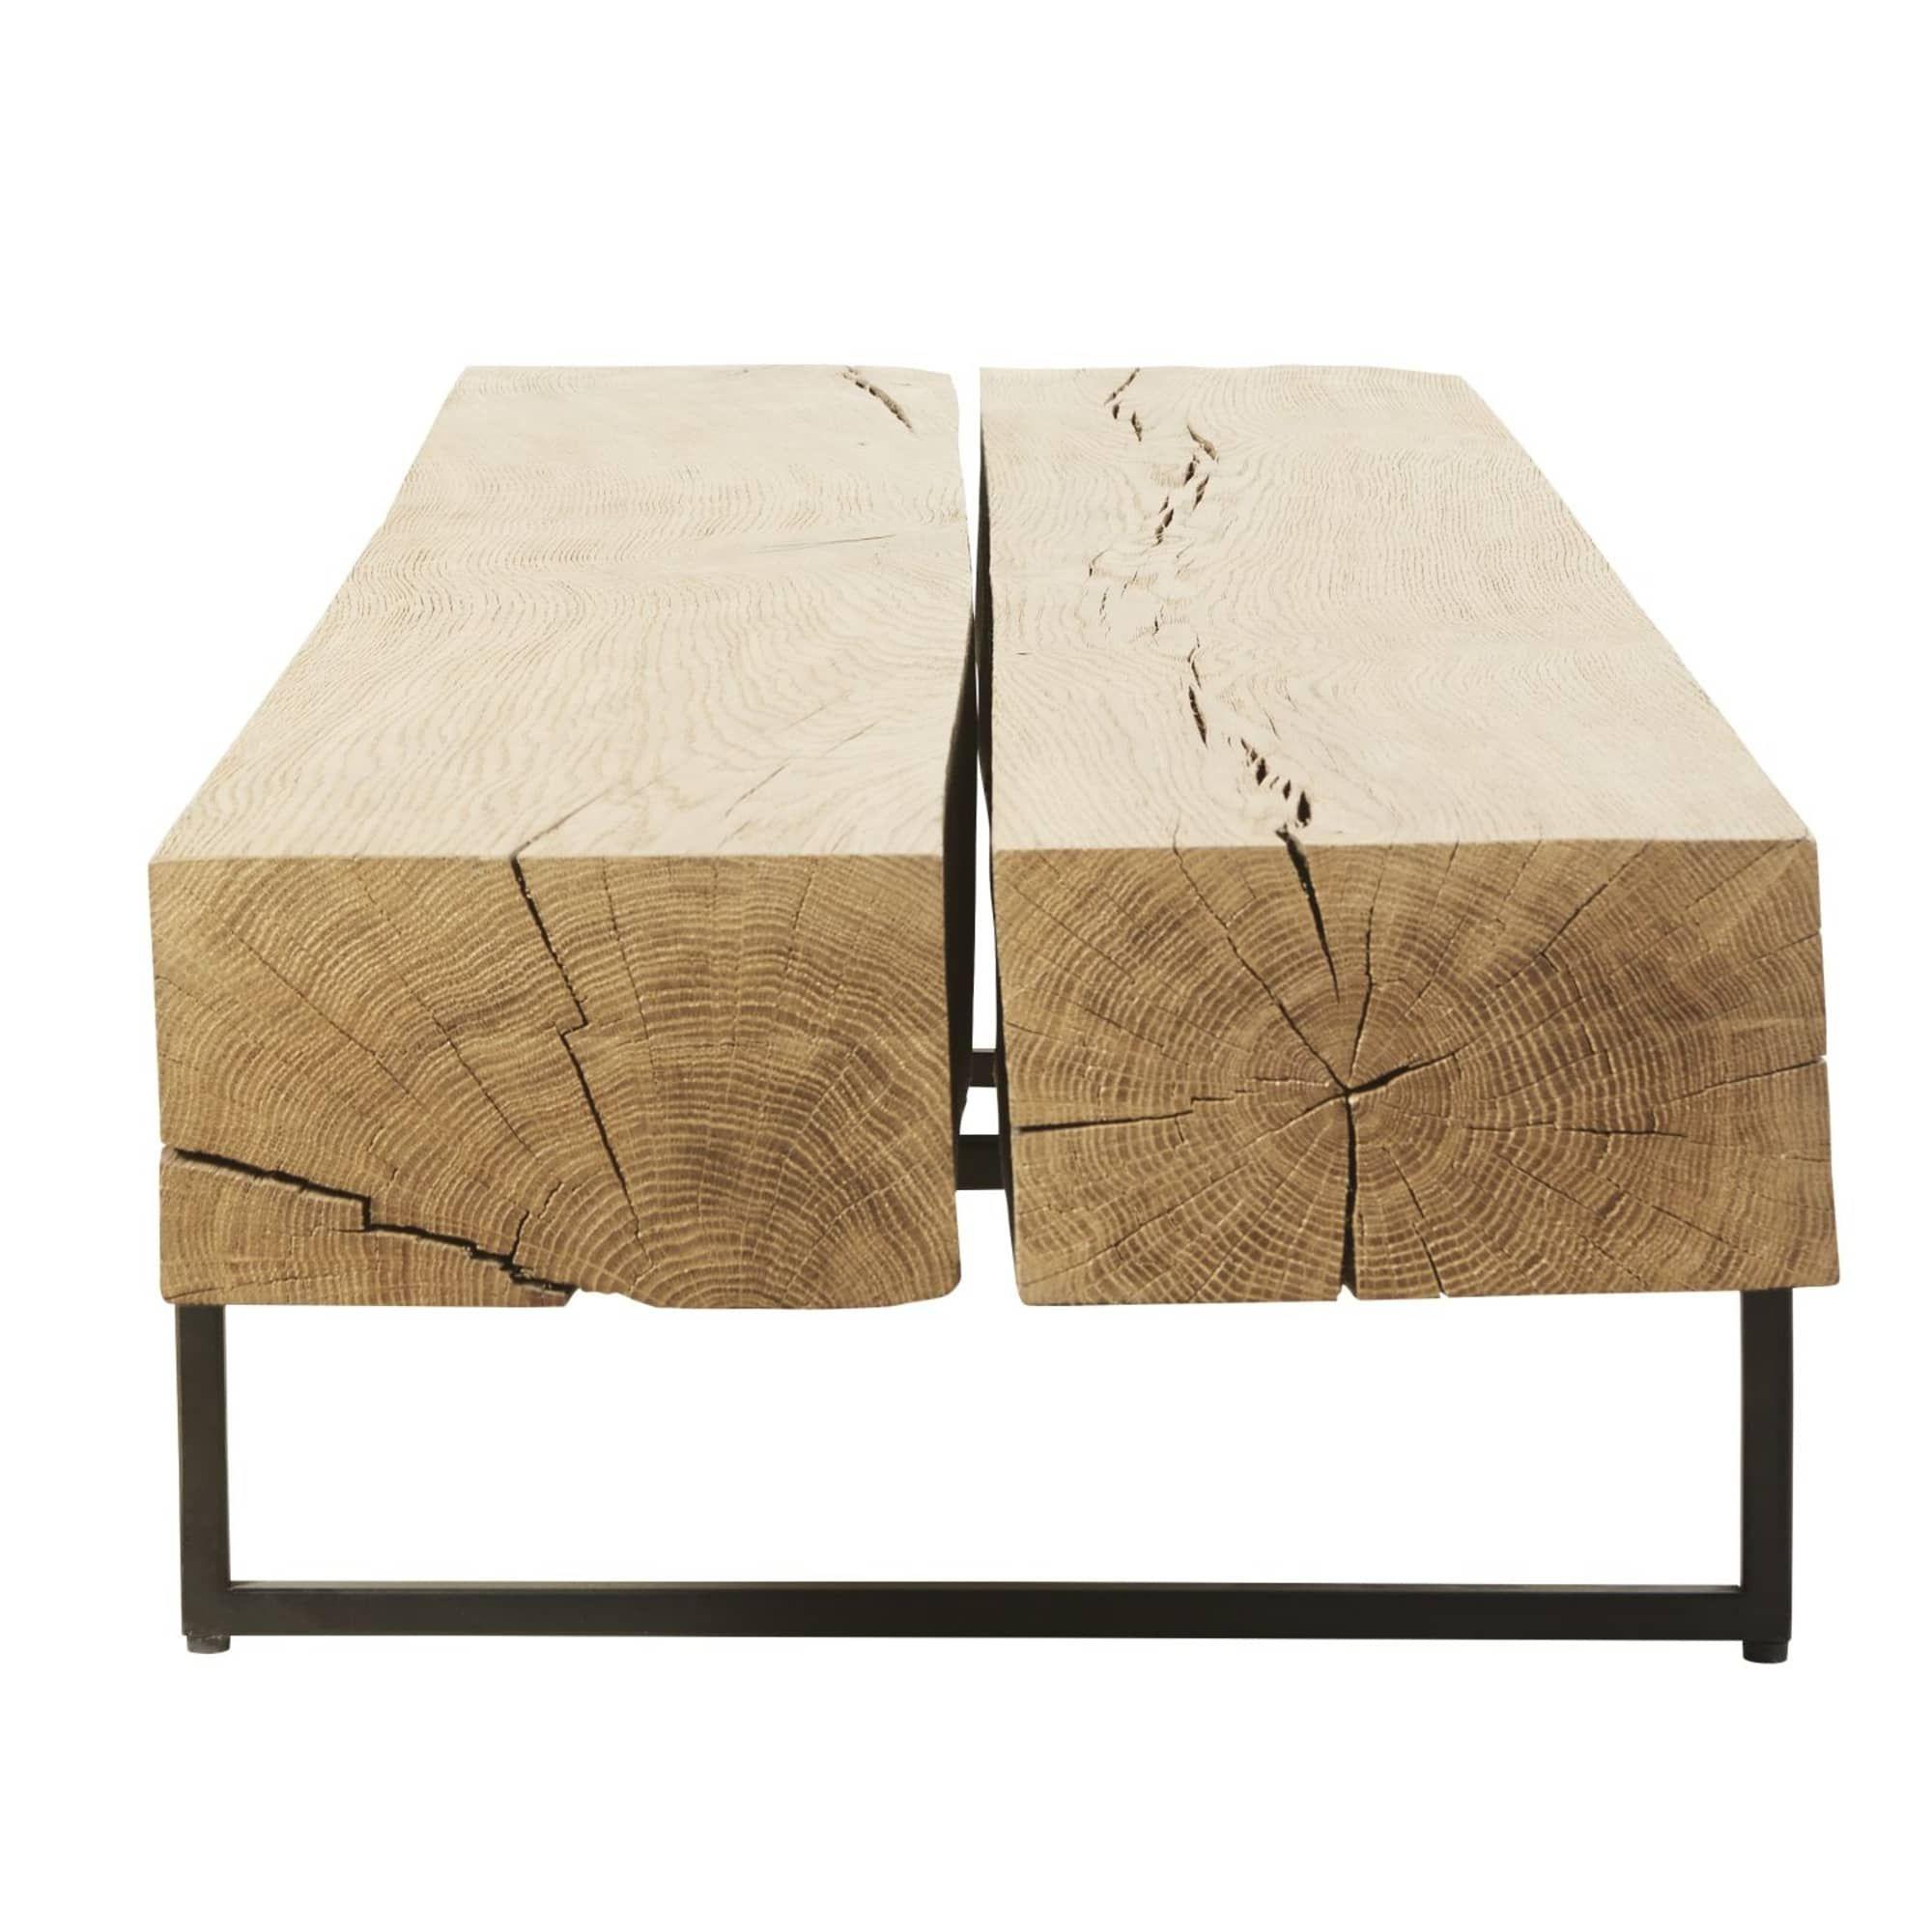 Table Basse En Chene Massif Et Metal Noir Magnus Maisons Du Monde Table Basse Chene Table Basse Bois Brut Table Basse